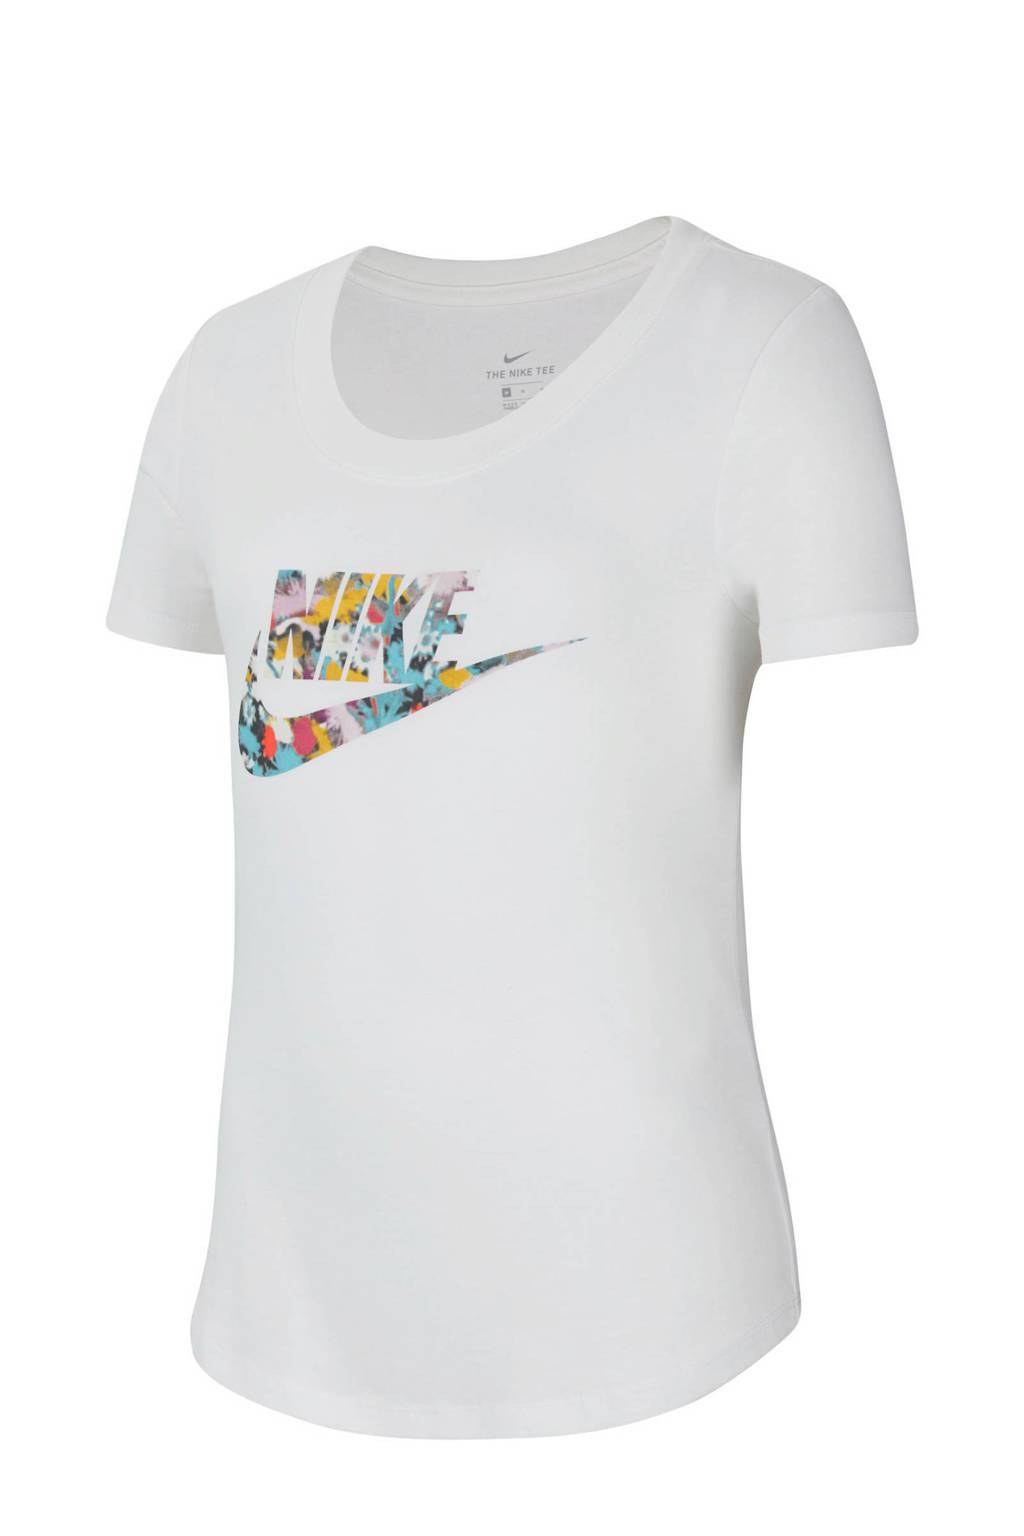 Nike T-shirt wit, Wit